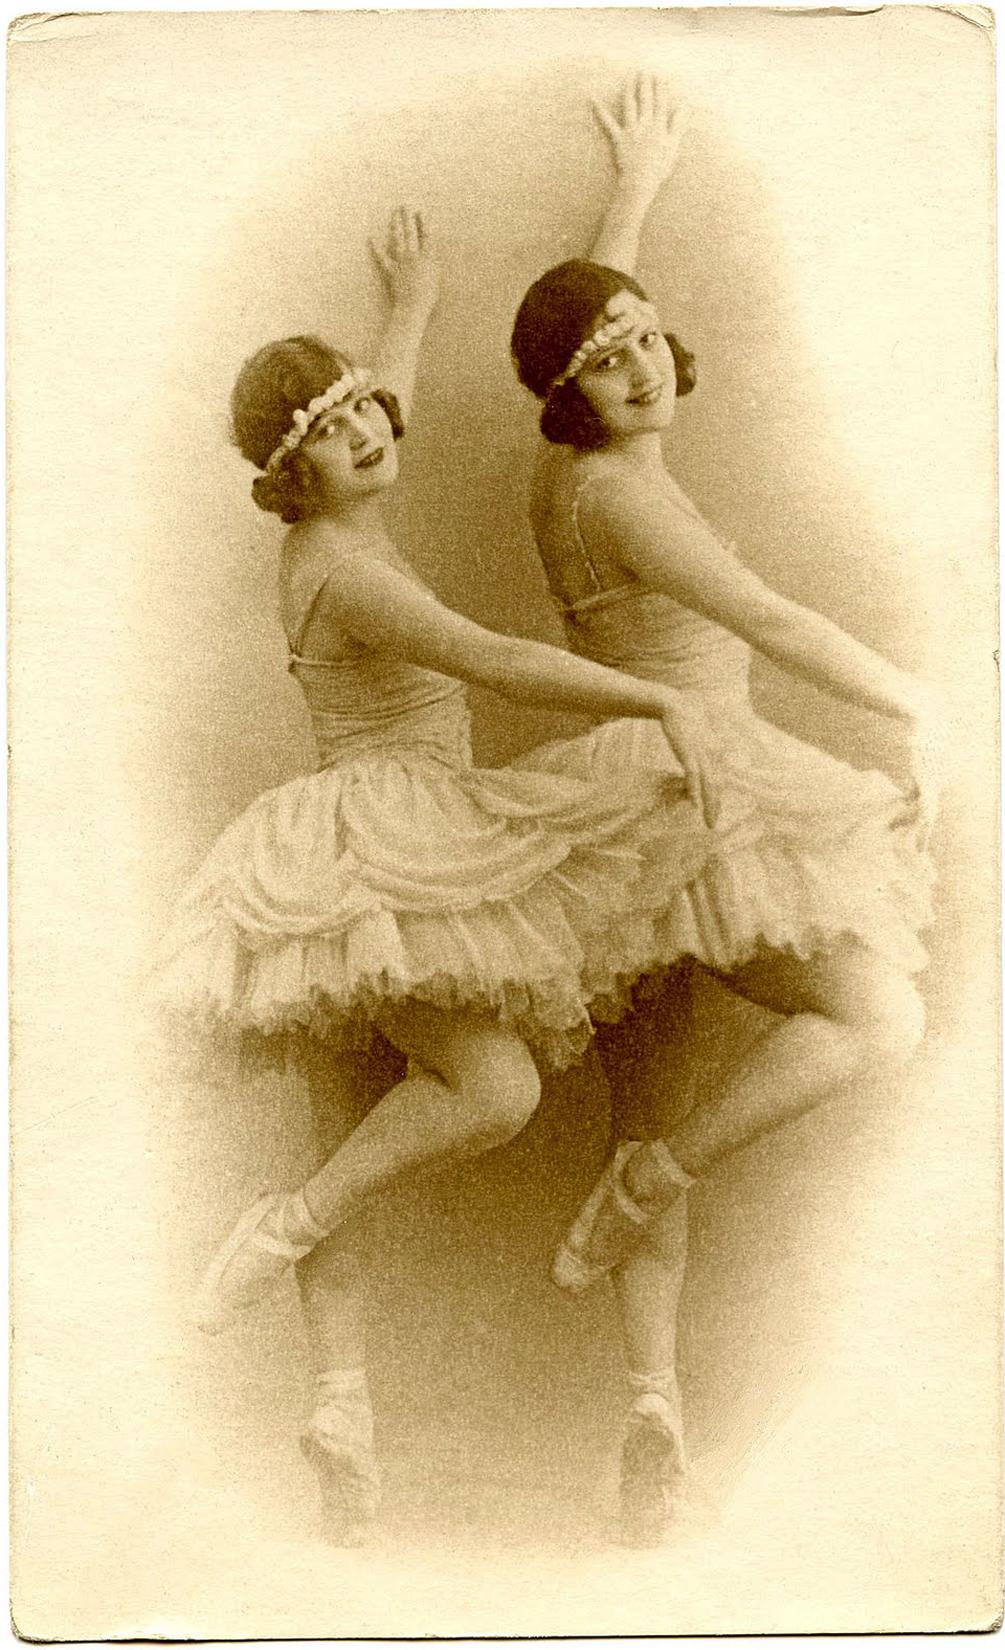 pictures clip art. Ballerina clipart vintage